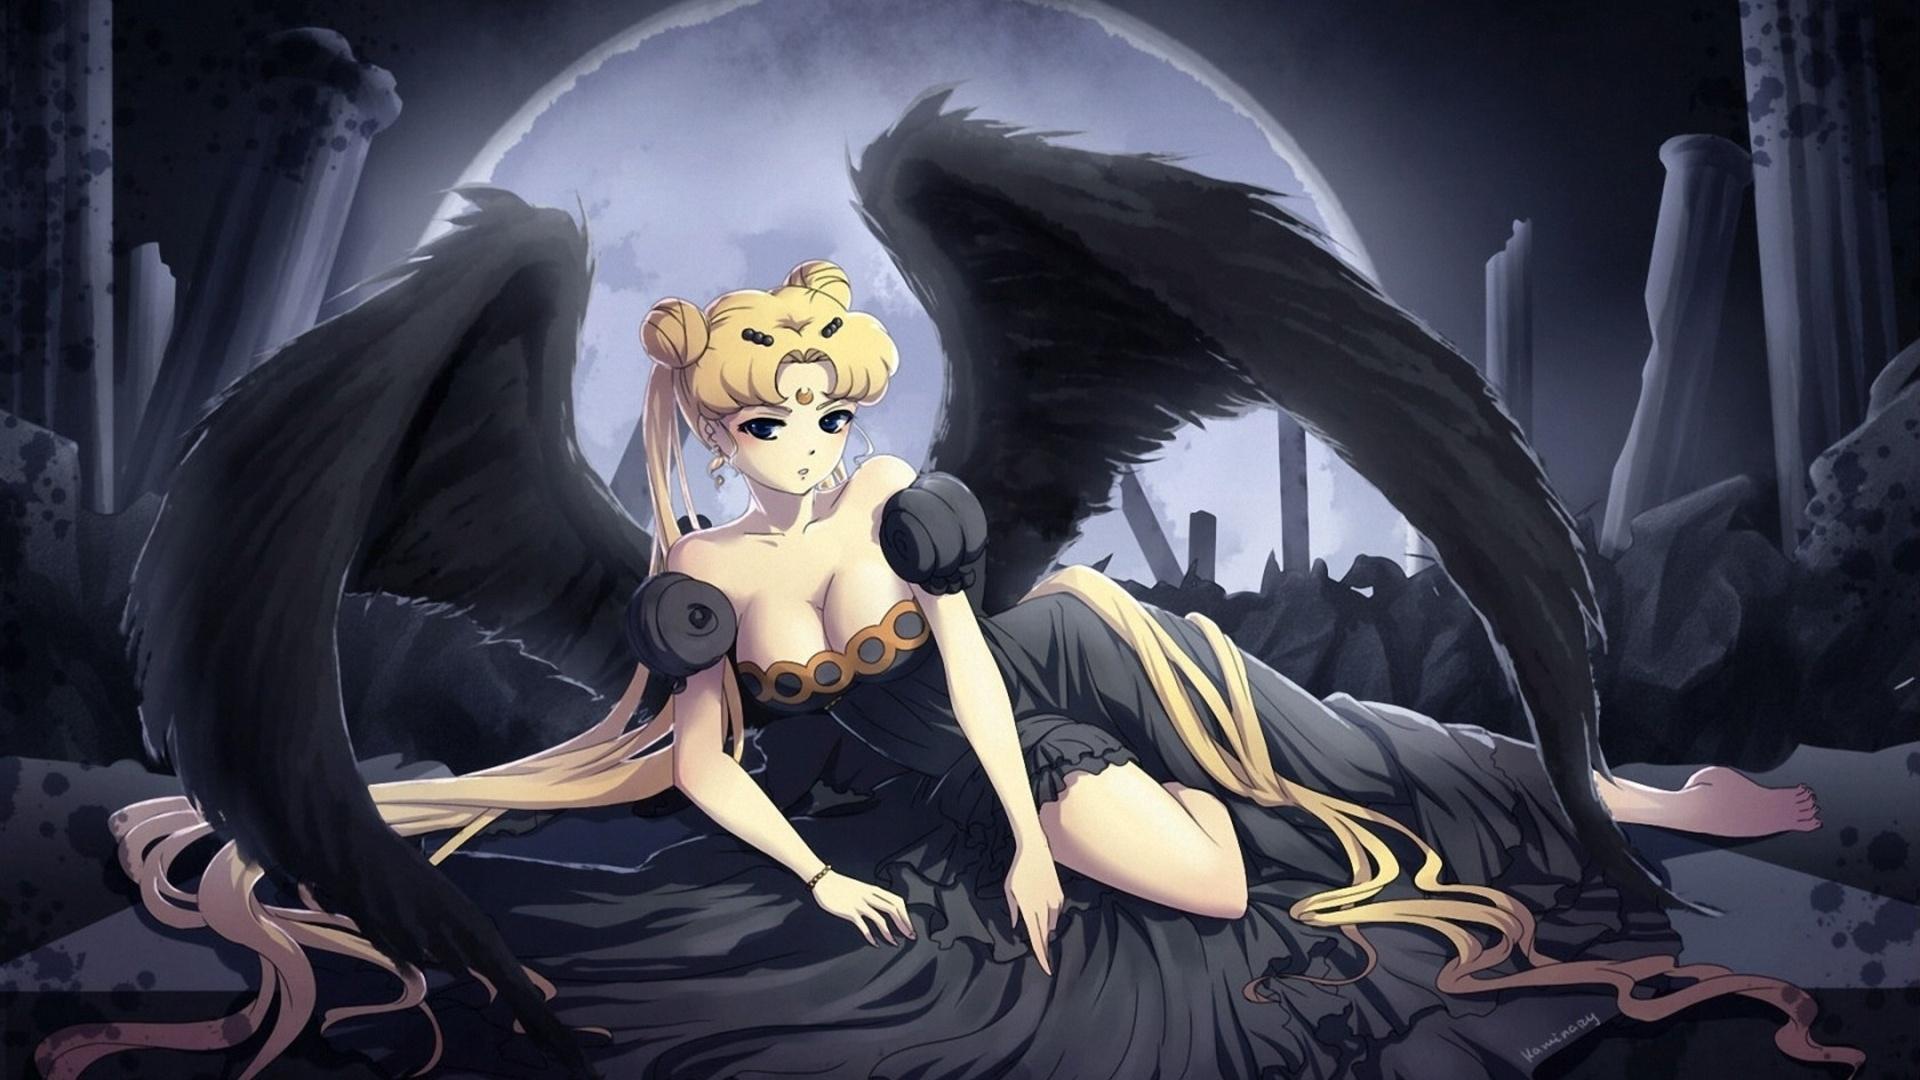 Anime Gothic Girl free background